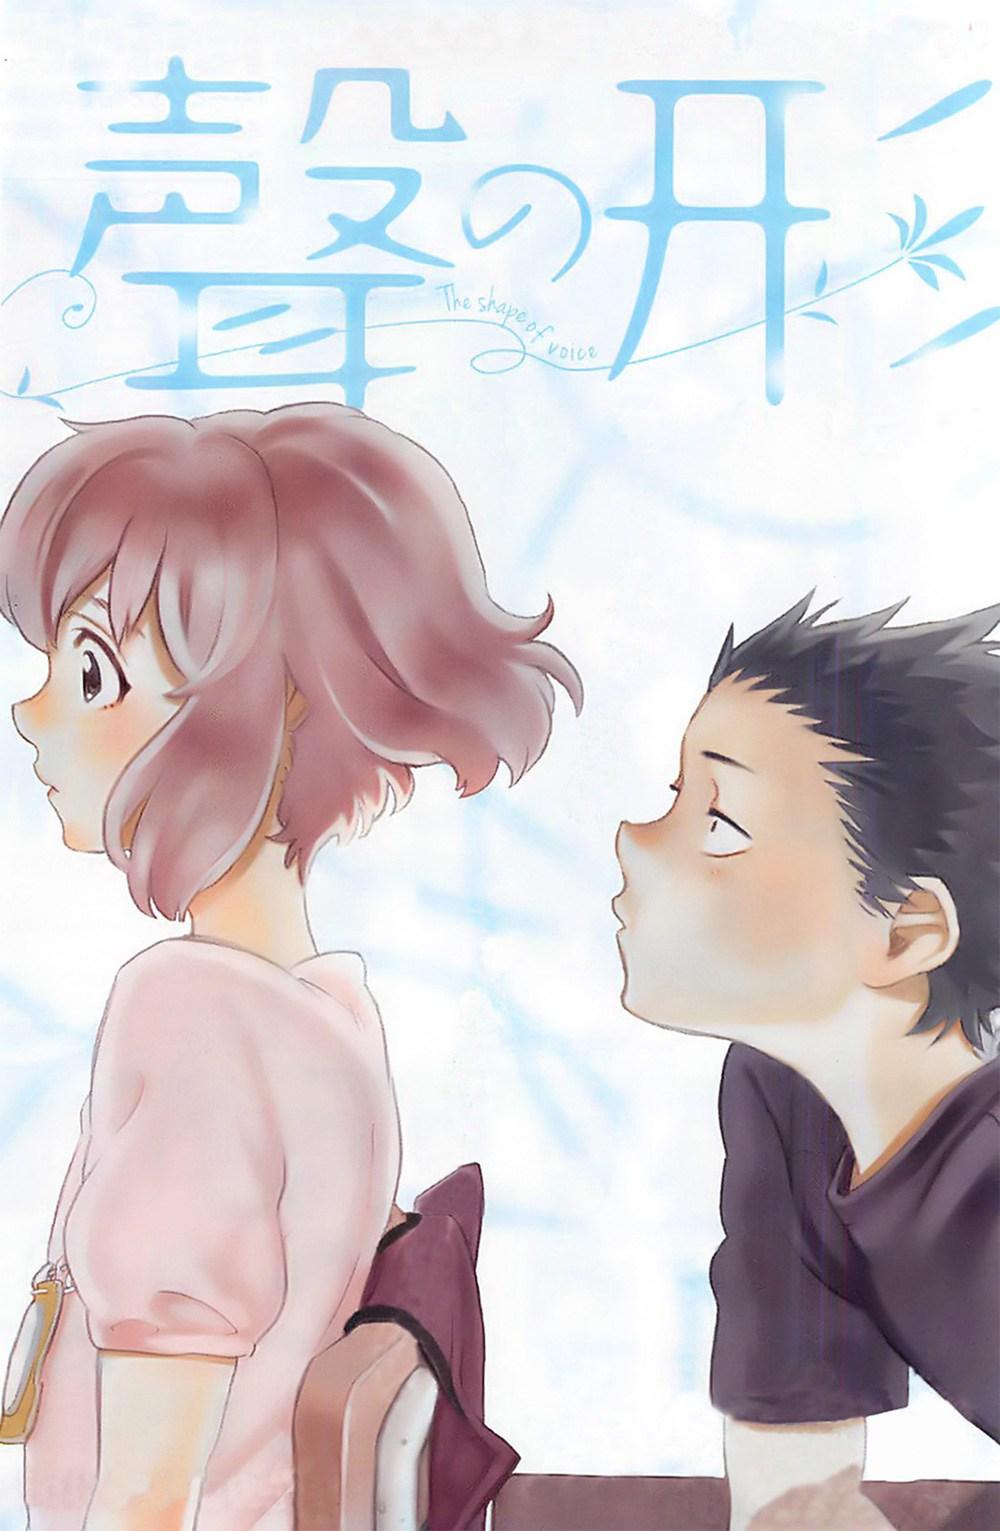 Kyoto-Animation-to-Produce-Koe-no-Katachi-Anime-Film-Share (1)